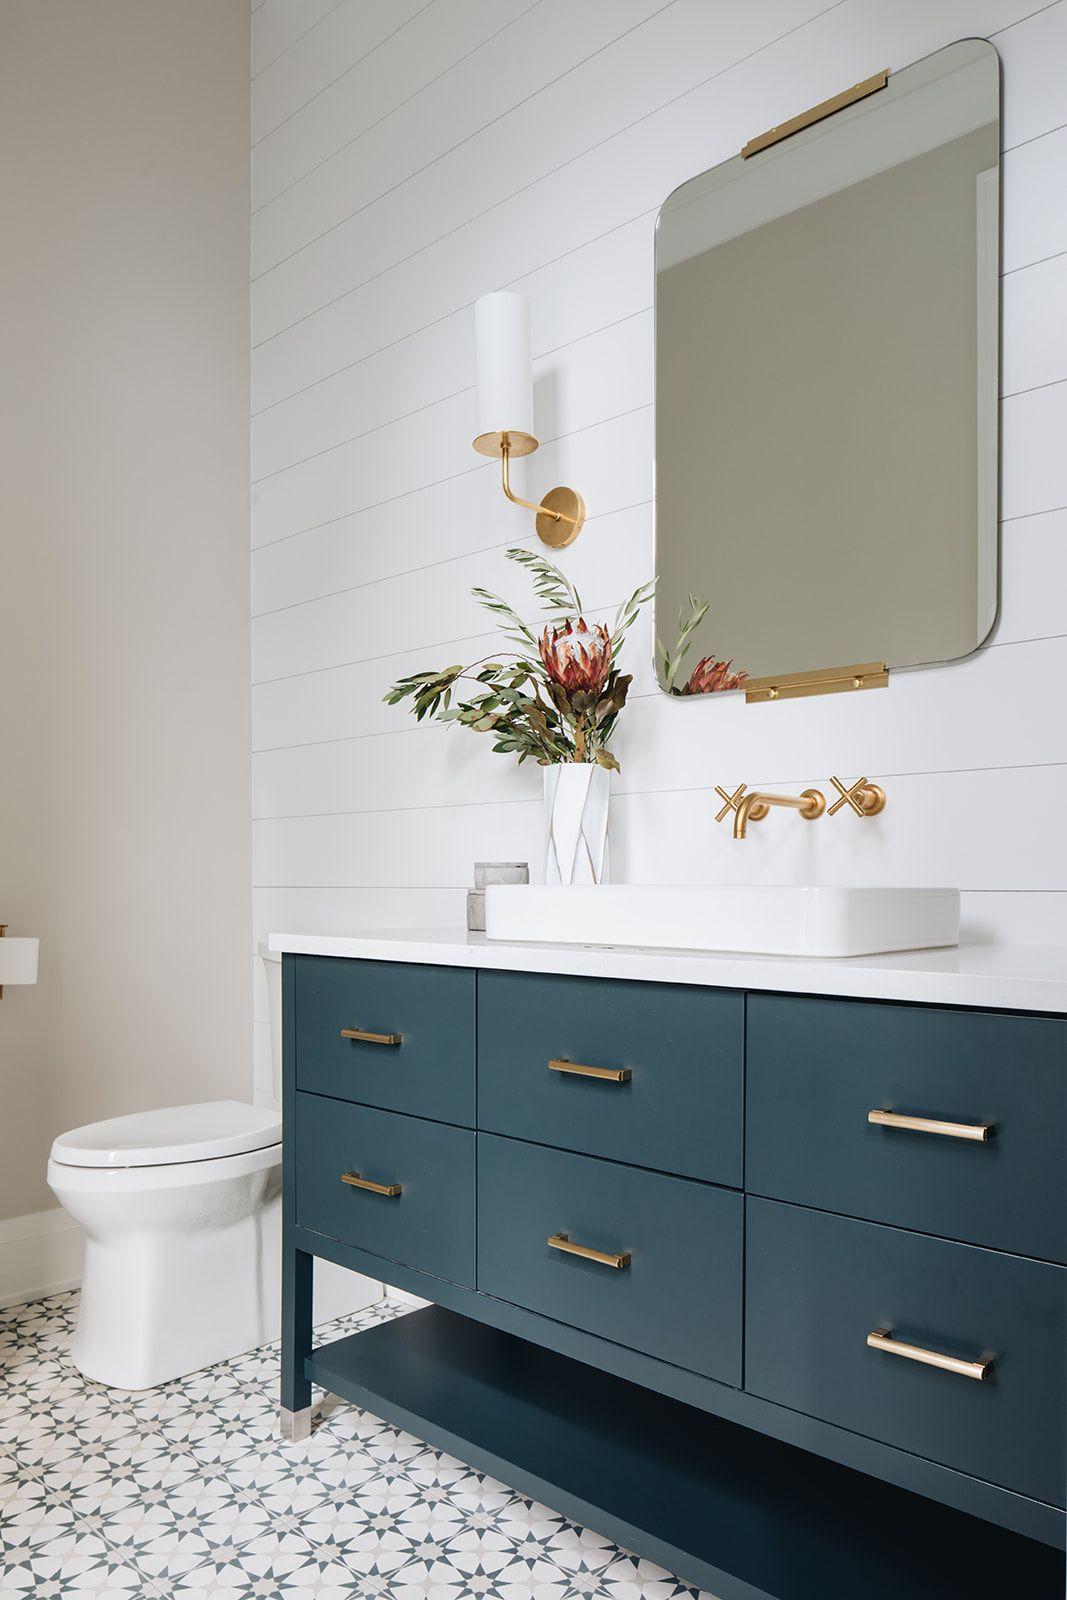 Fresh Coastal Bathroom Remodel White Bathroom Tiles Bathroom Tile Designs Blue Bathroom Vanity